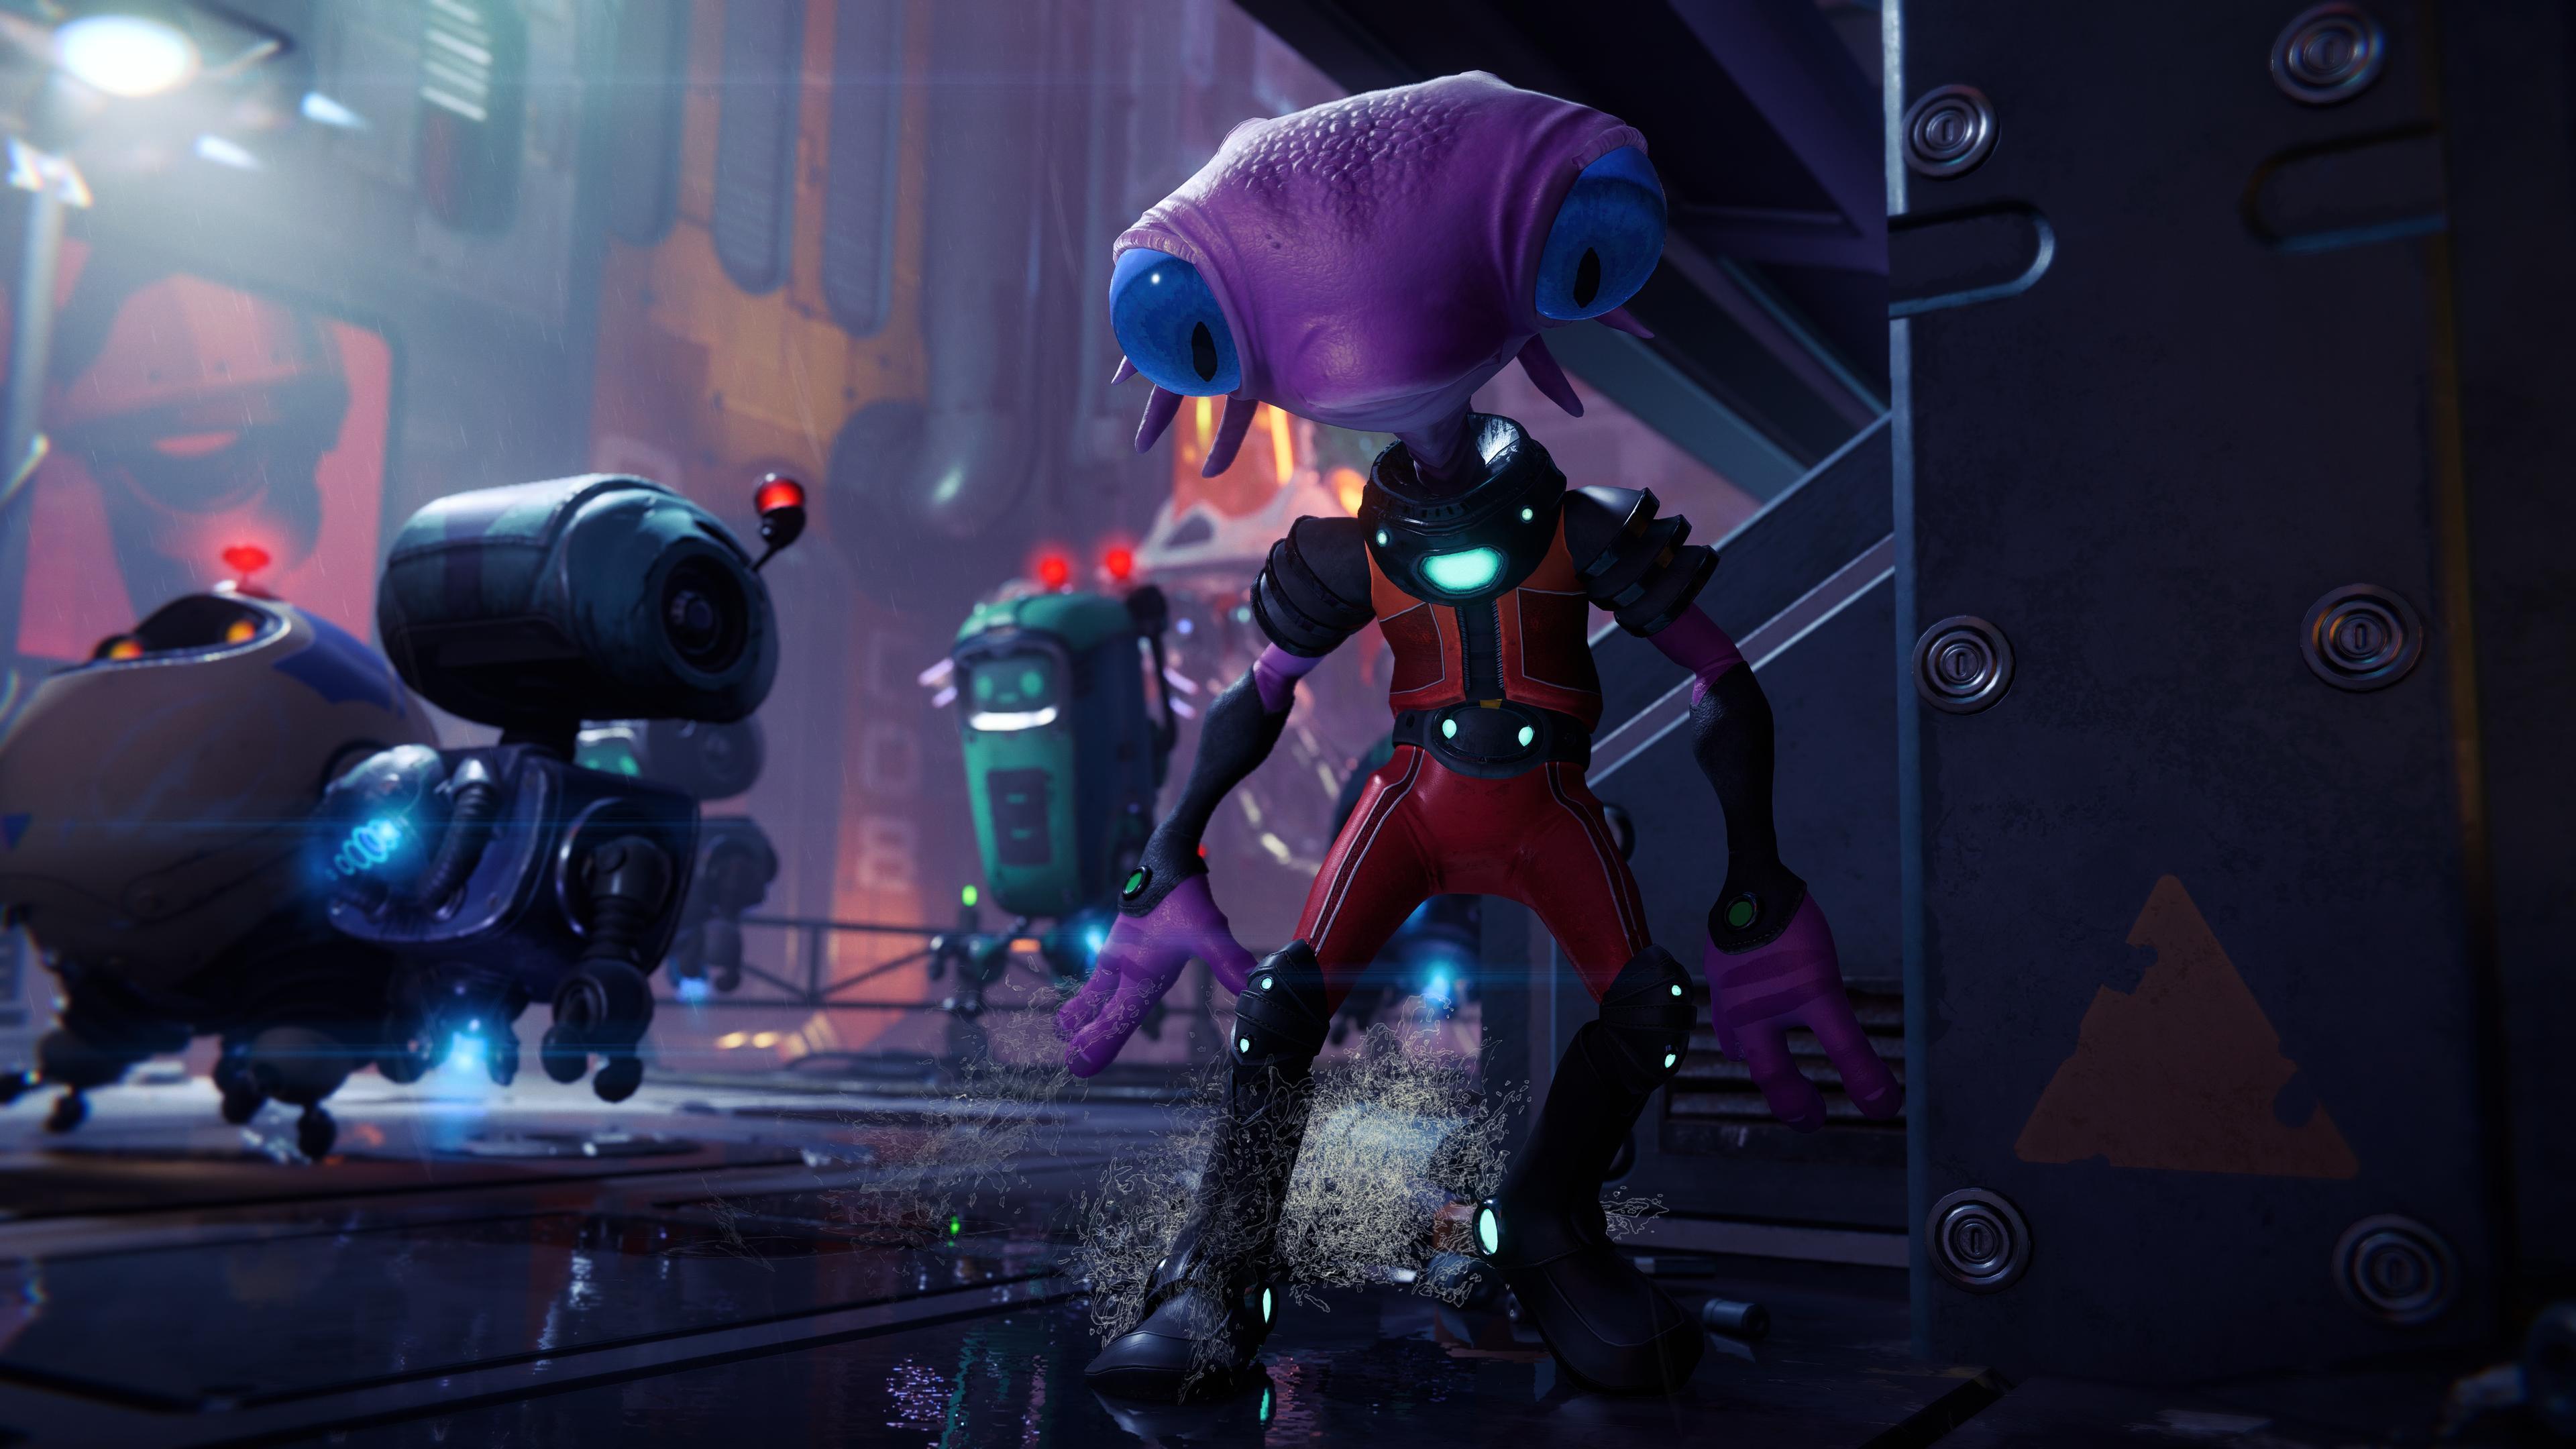 Ratchet & Clank: A Rift Apart